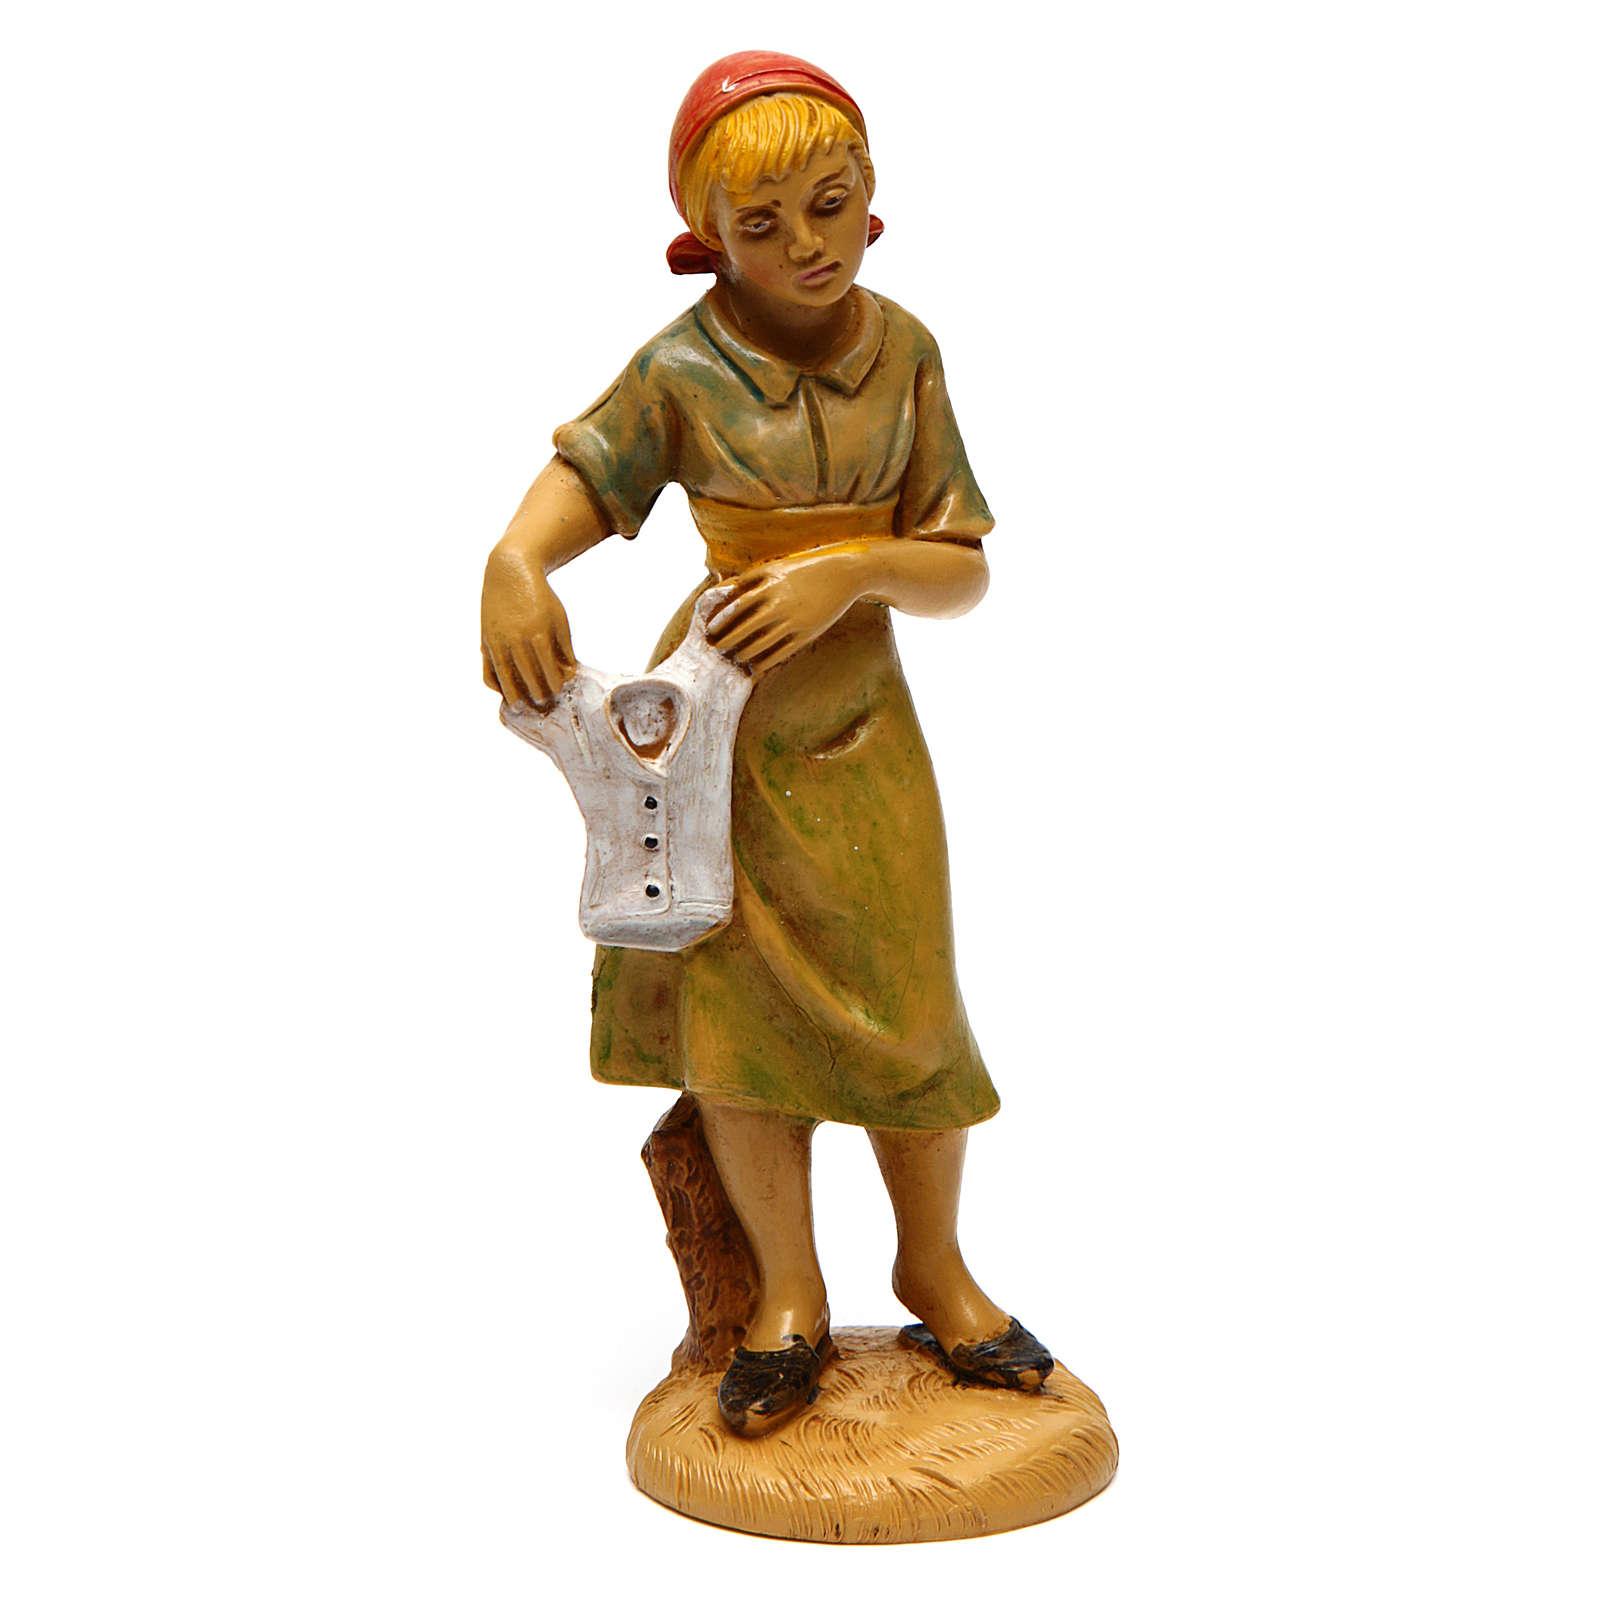 Mujer que tende para belén 12 cm de altura media 3